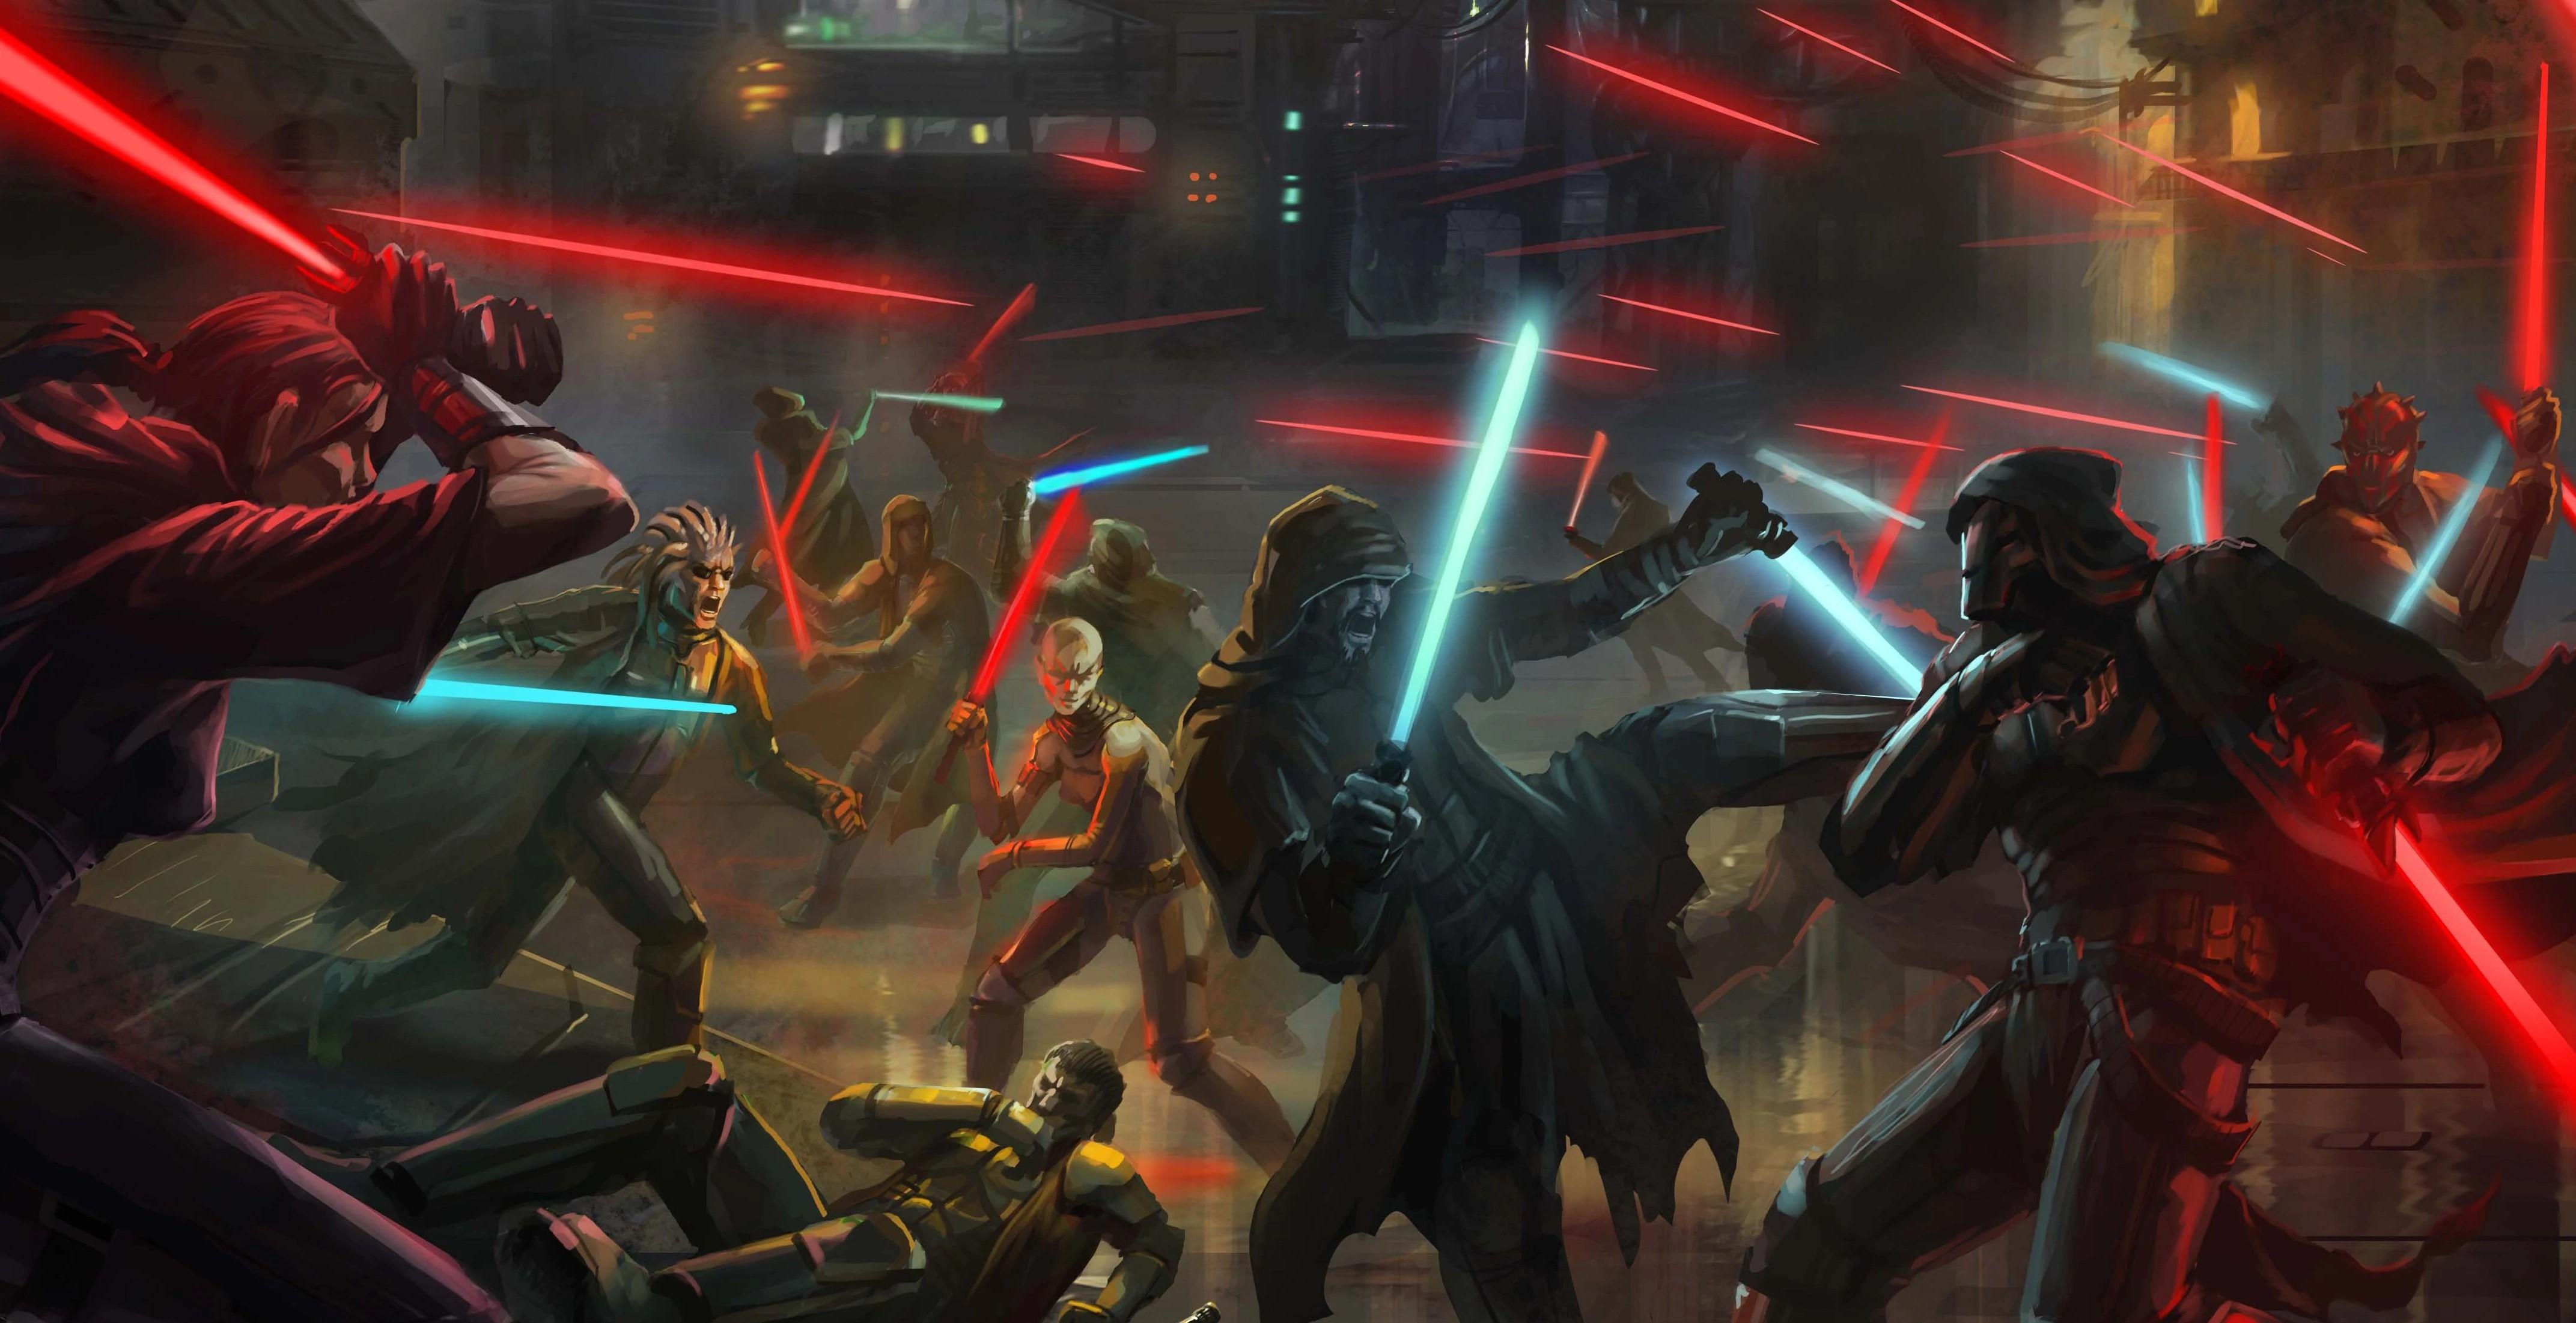 Archivo:Great War Jedi vs Sith.jpg